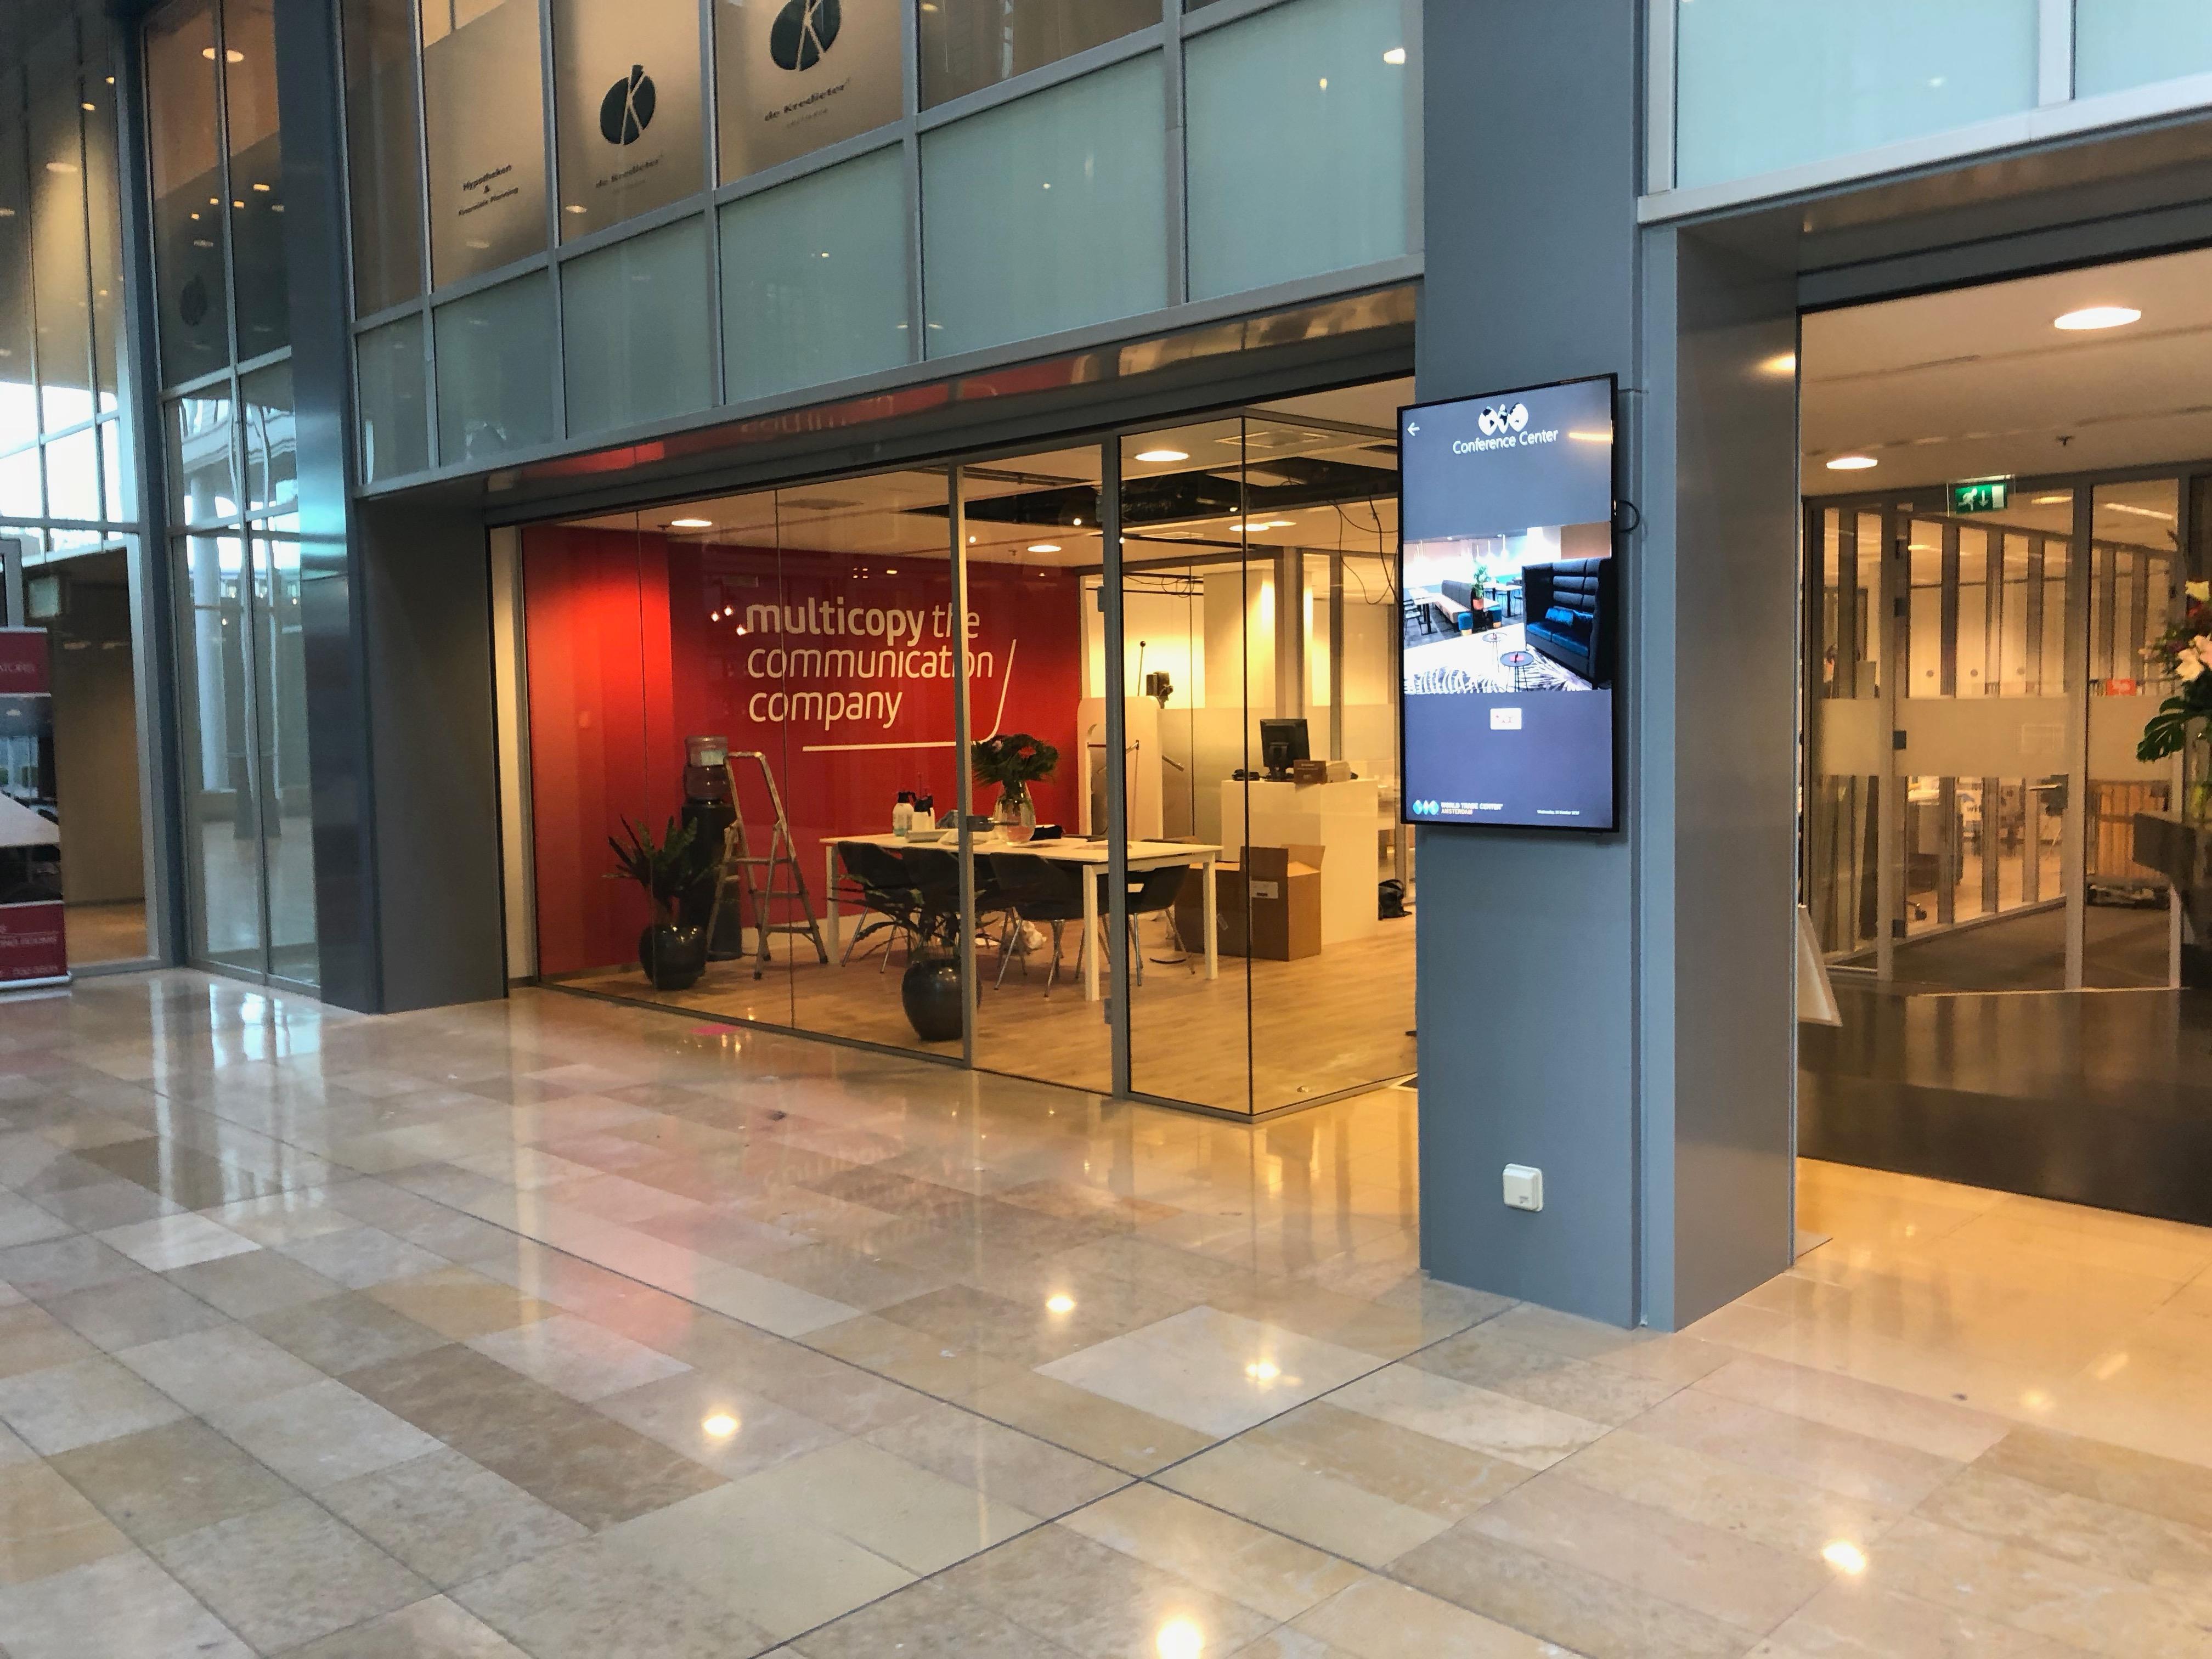 Multicopy The Communication Company | Amsterdam WTC